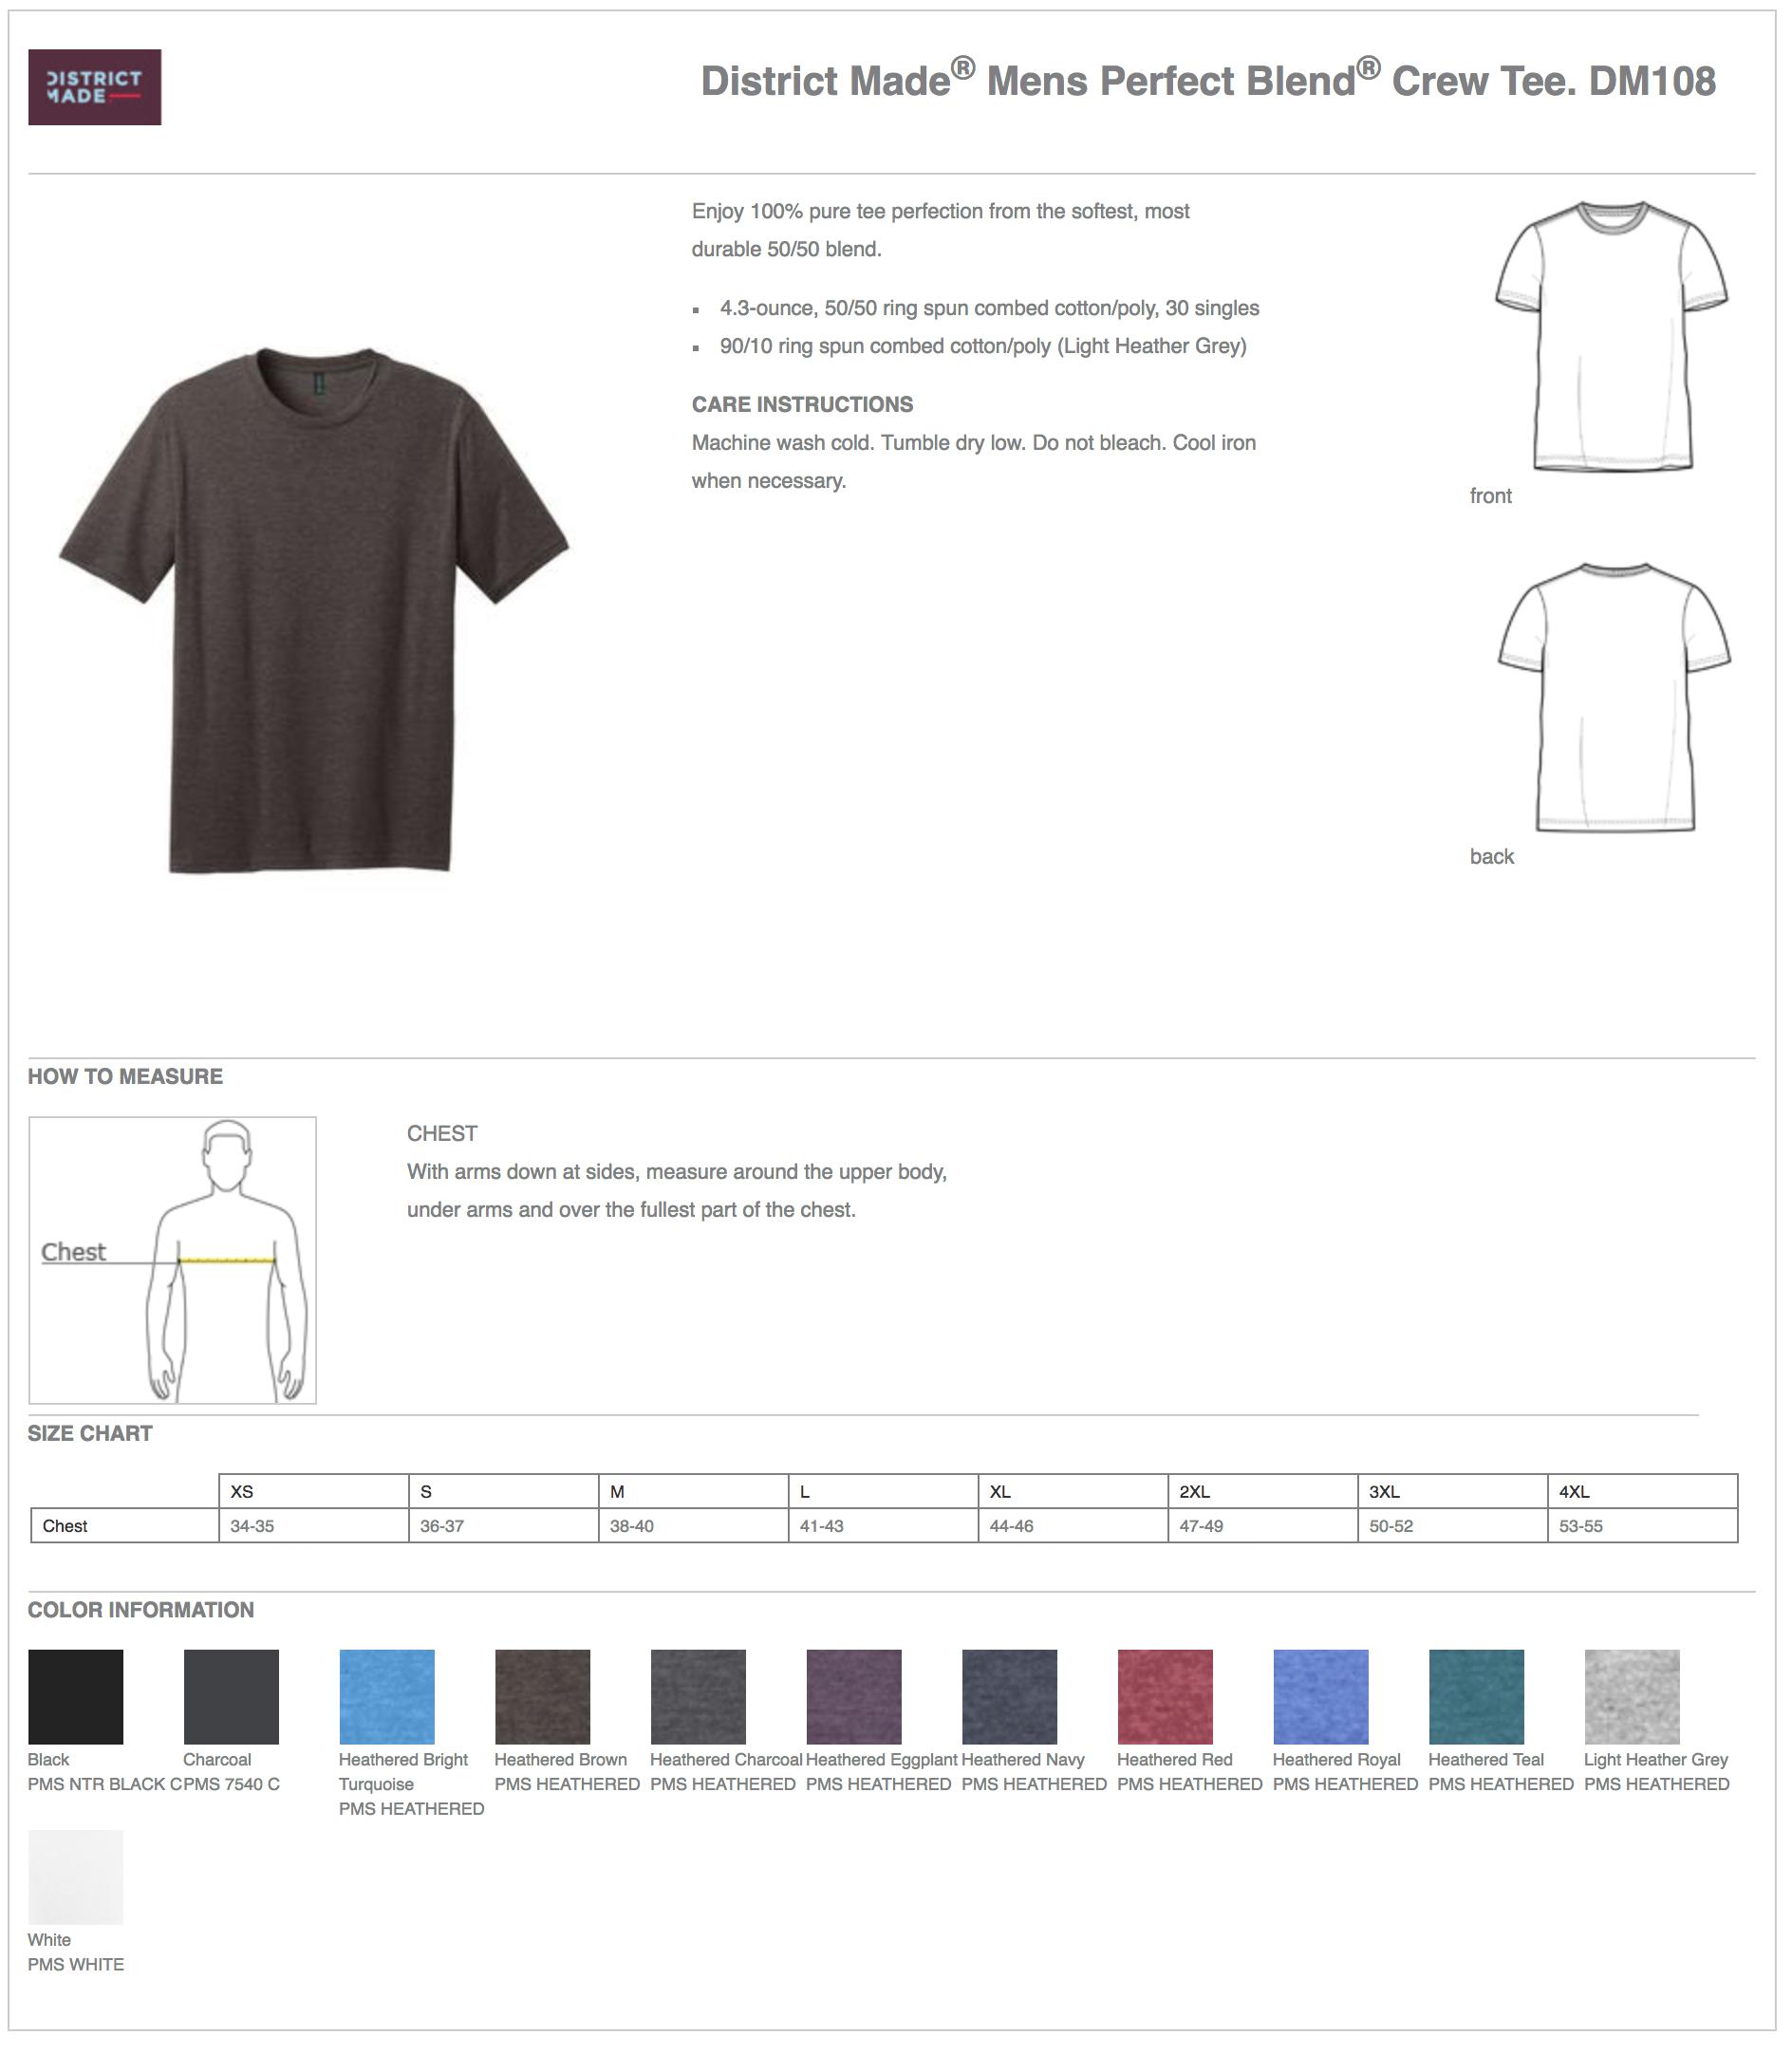 District Made DM108 Custom T-Shirts